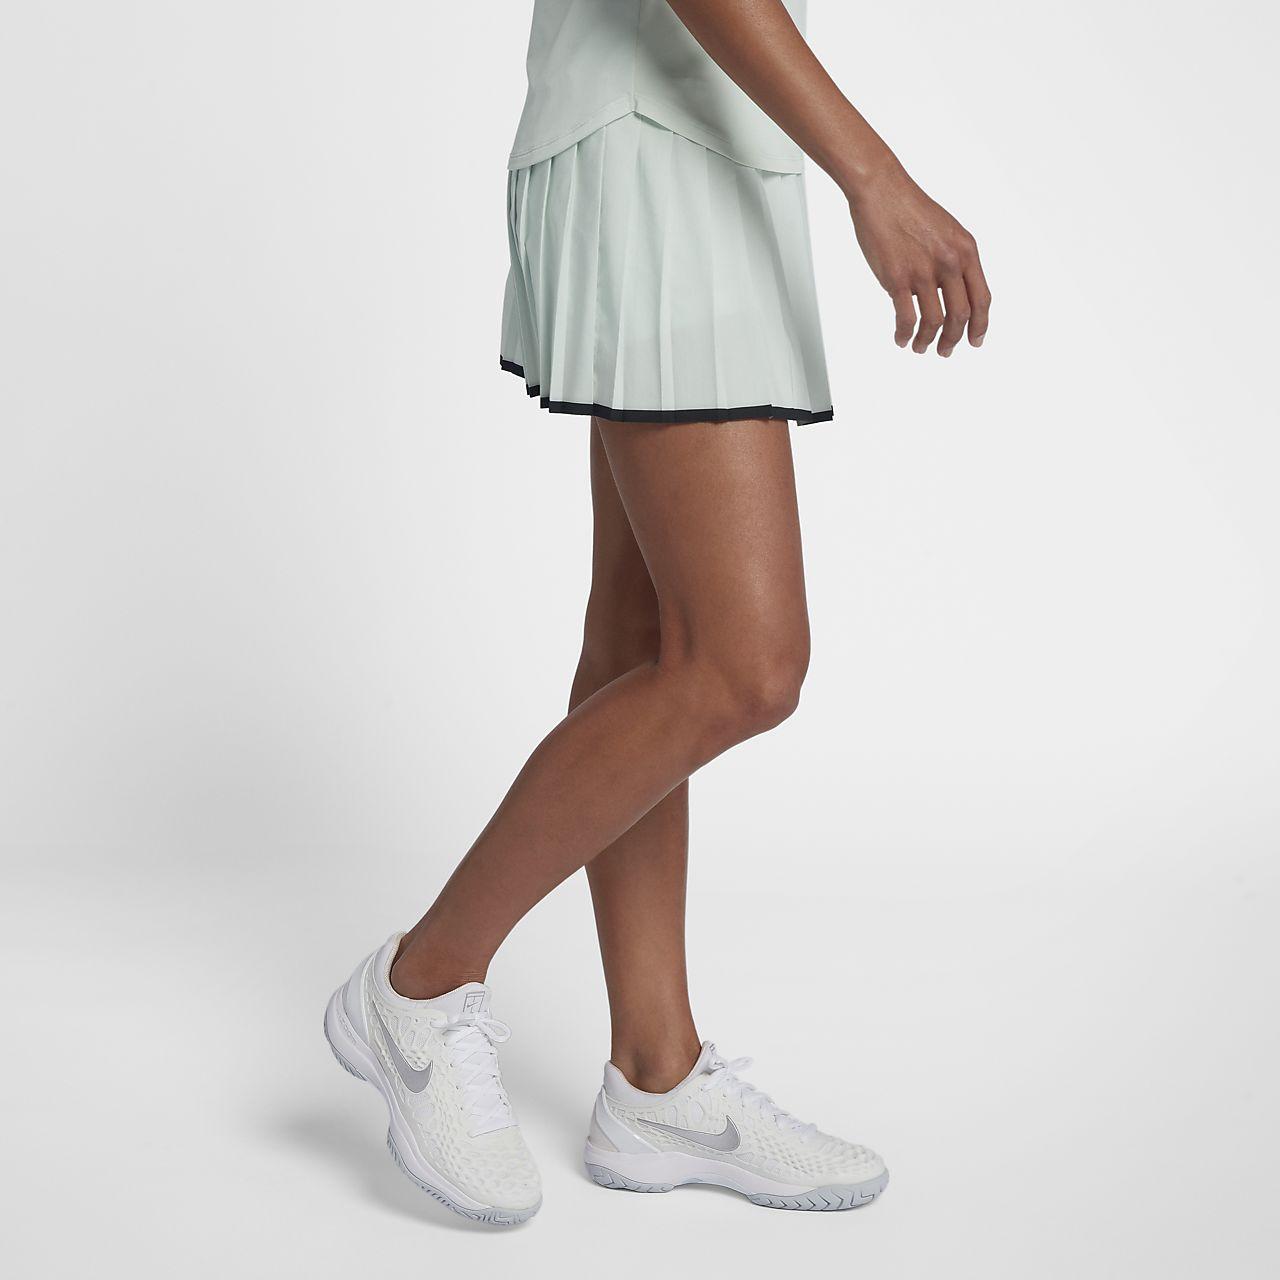 ... NikeCourt Victory Women's Tennis Skirt